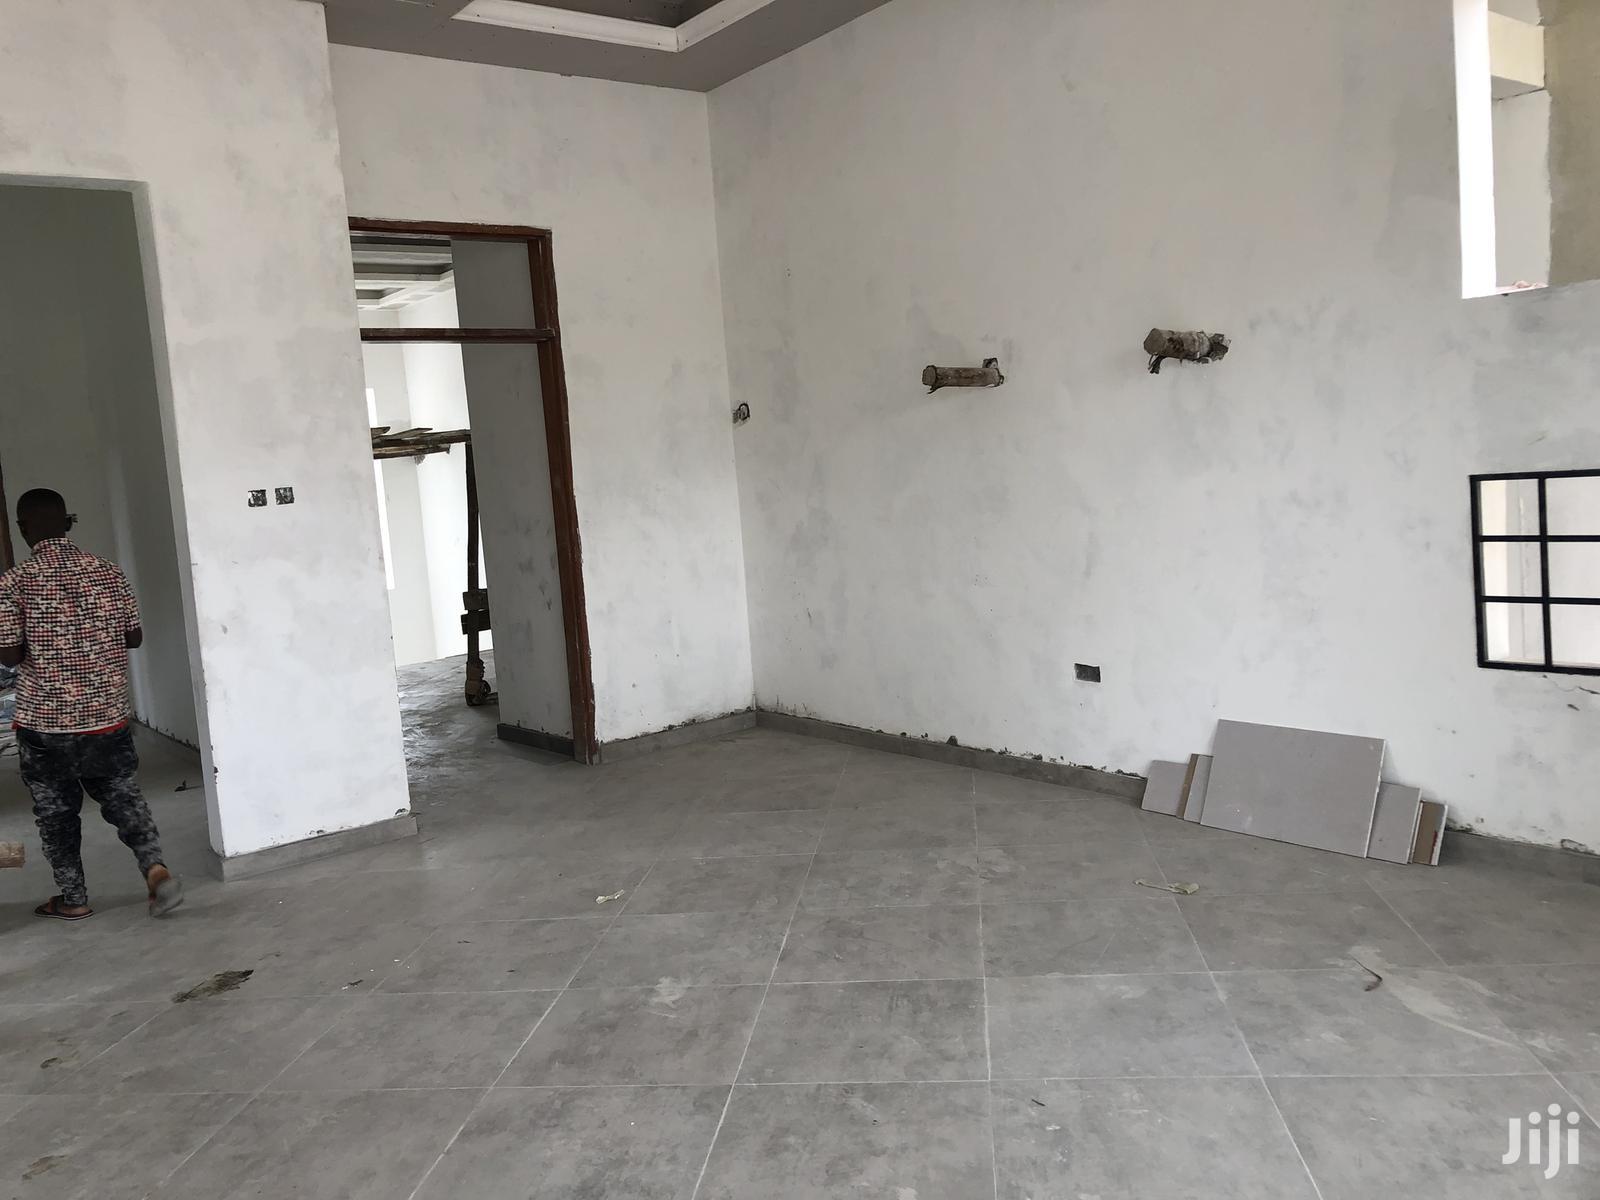 Five Bedroom Mansion In Kira For Sale   Houses & Apartments For Sale for sale in Kampala, Central Region, Uganda